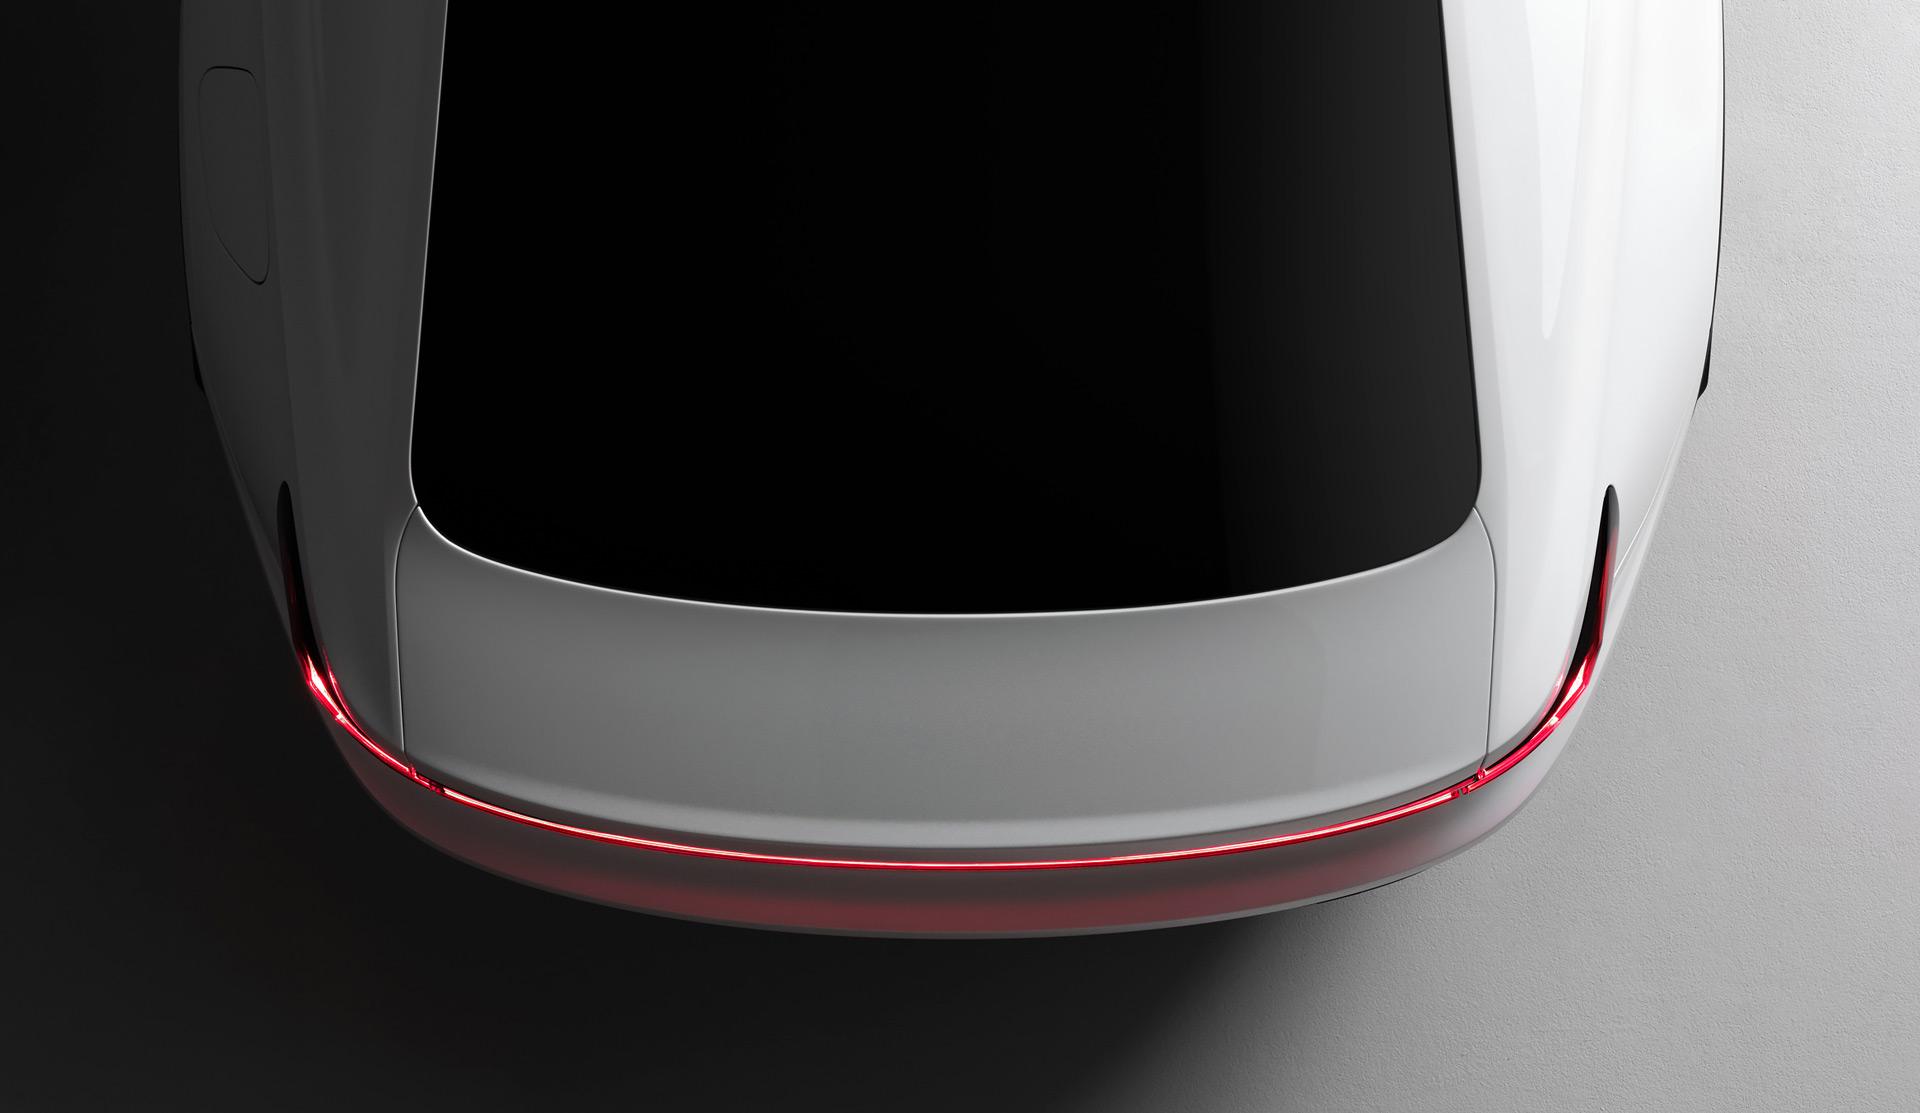 Tesla recall, Lucid efficiency, Polestar interiors, electric fire truck: Today's Car News